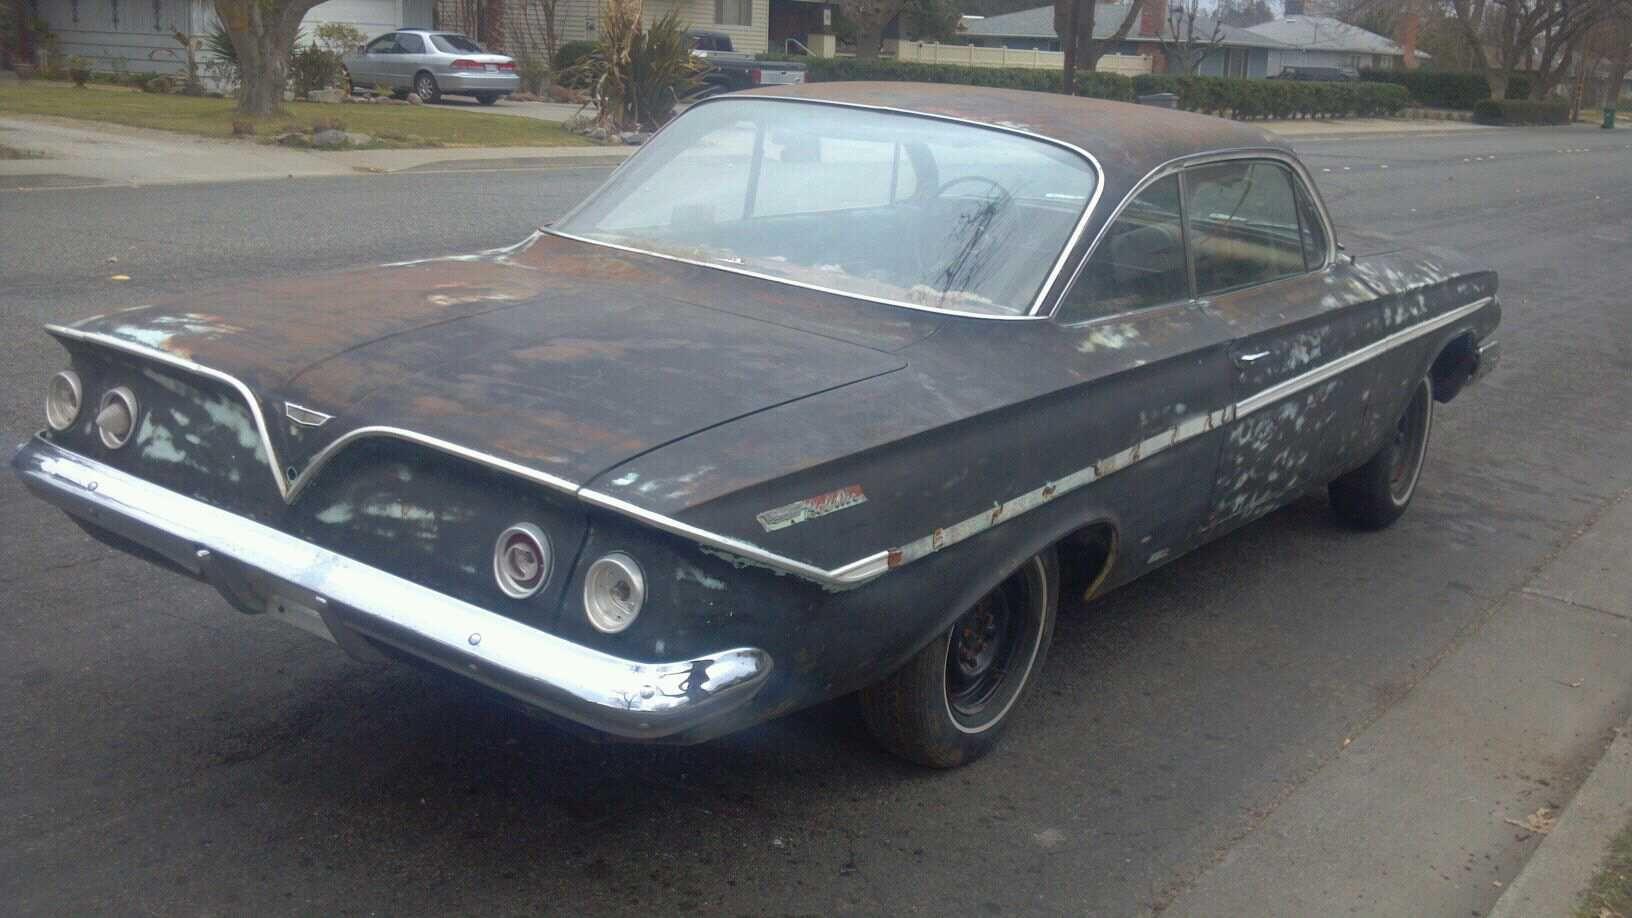 1961 impala lowrider  Google Search  impalaslowlows